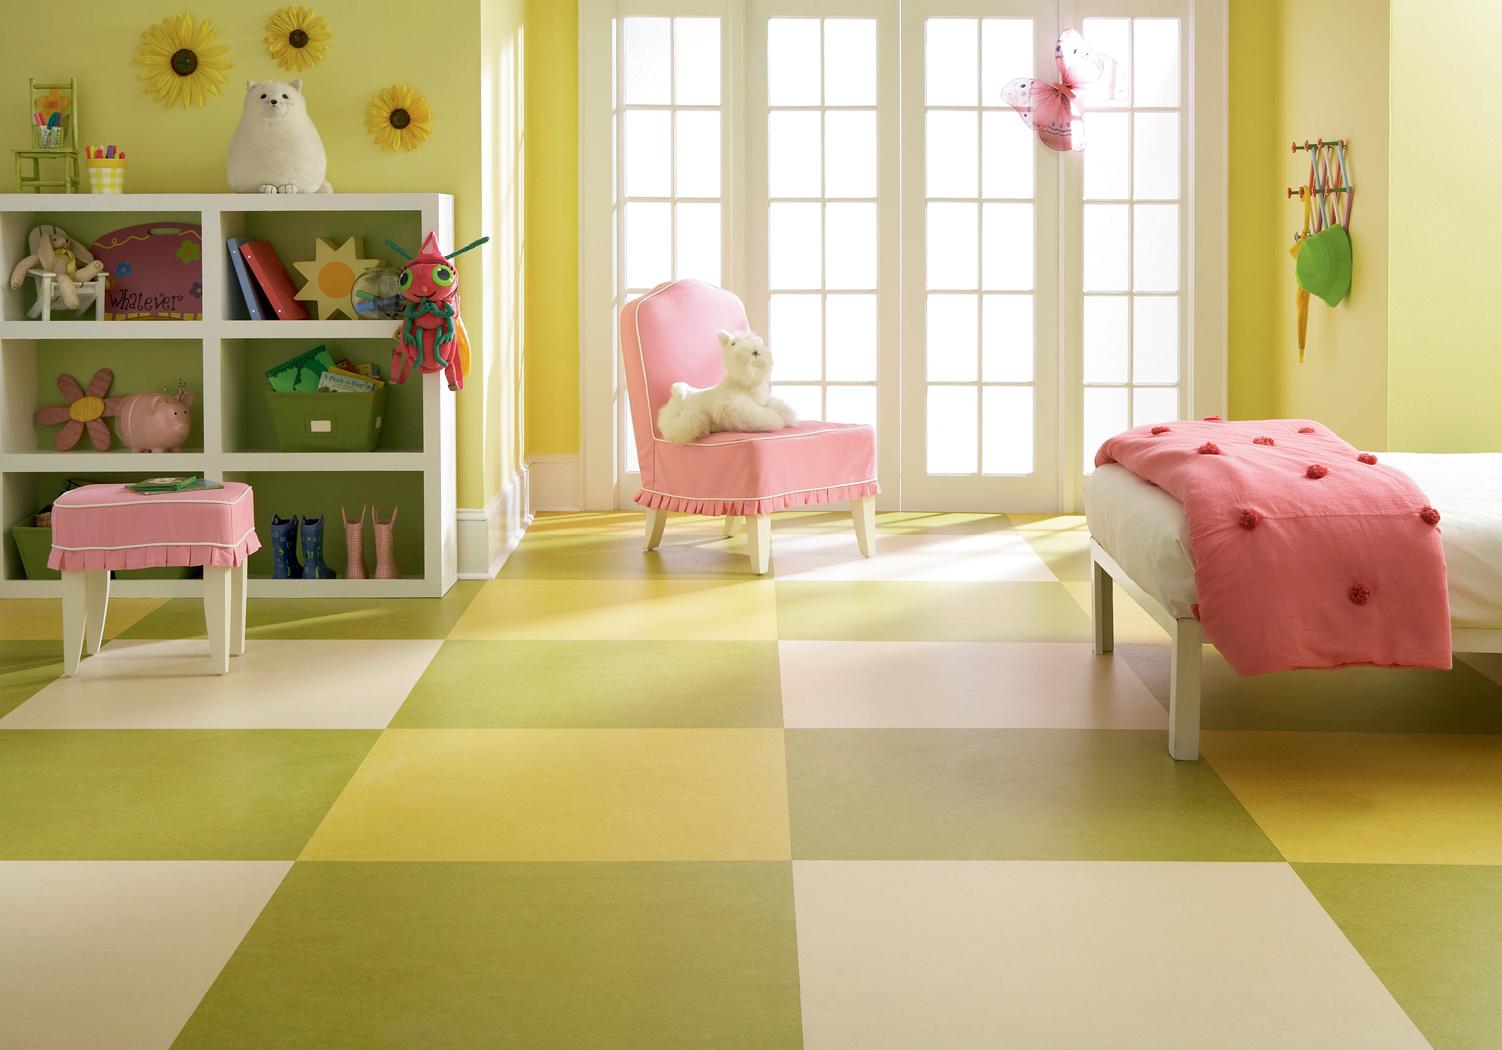 allergy free flooring